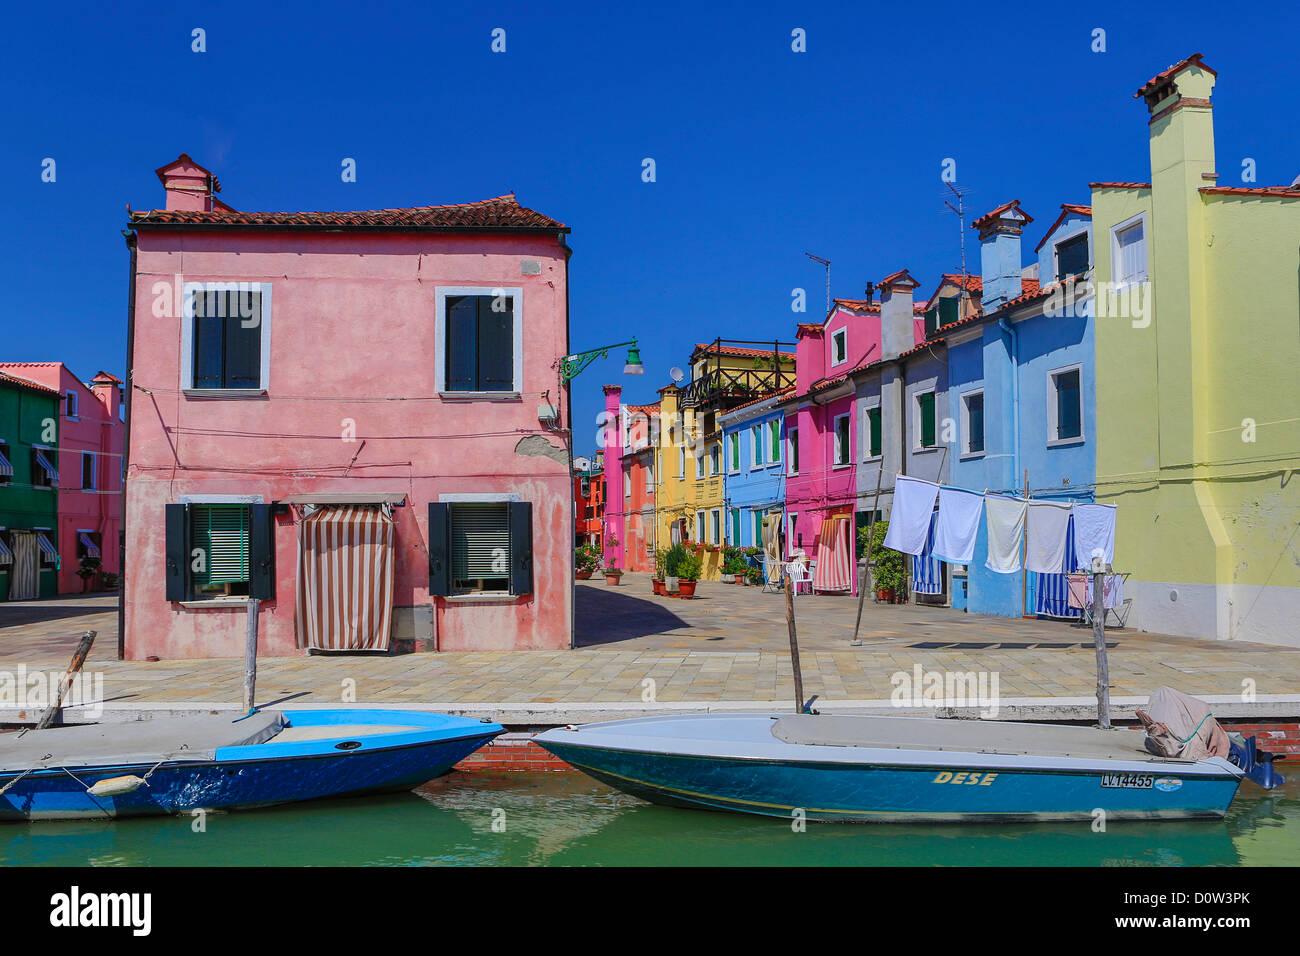 Italien, Europa, Reisen, Architektur, Boote, Burano, Kanal, bunt, Farben, Tourismus, Venedig Stockbild